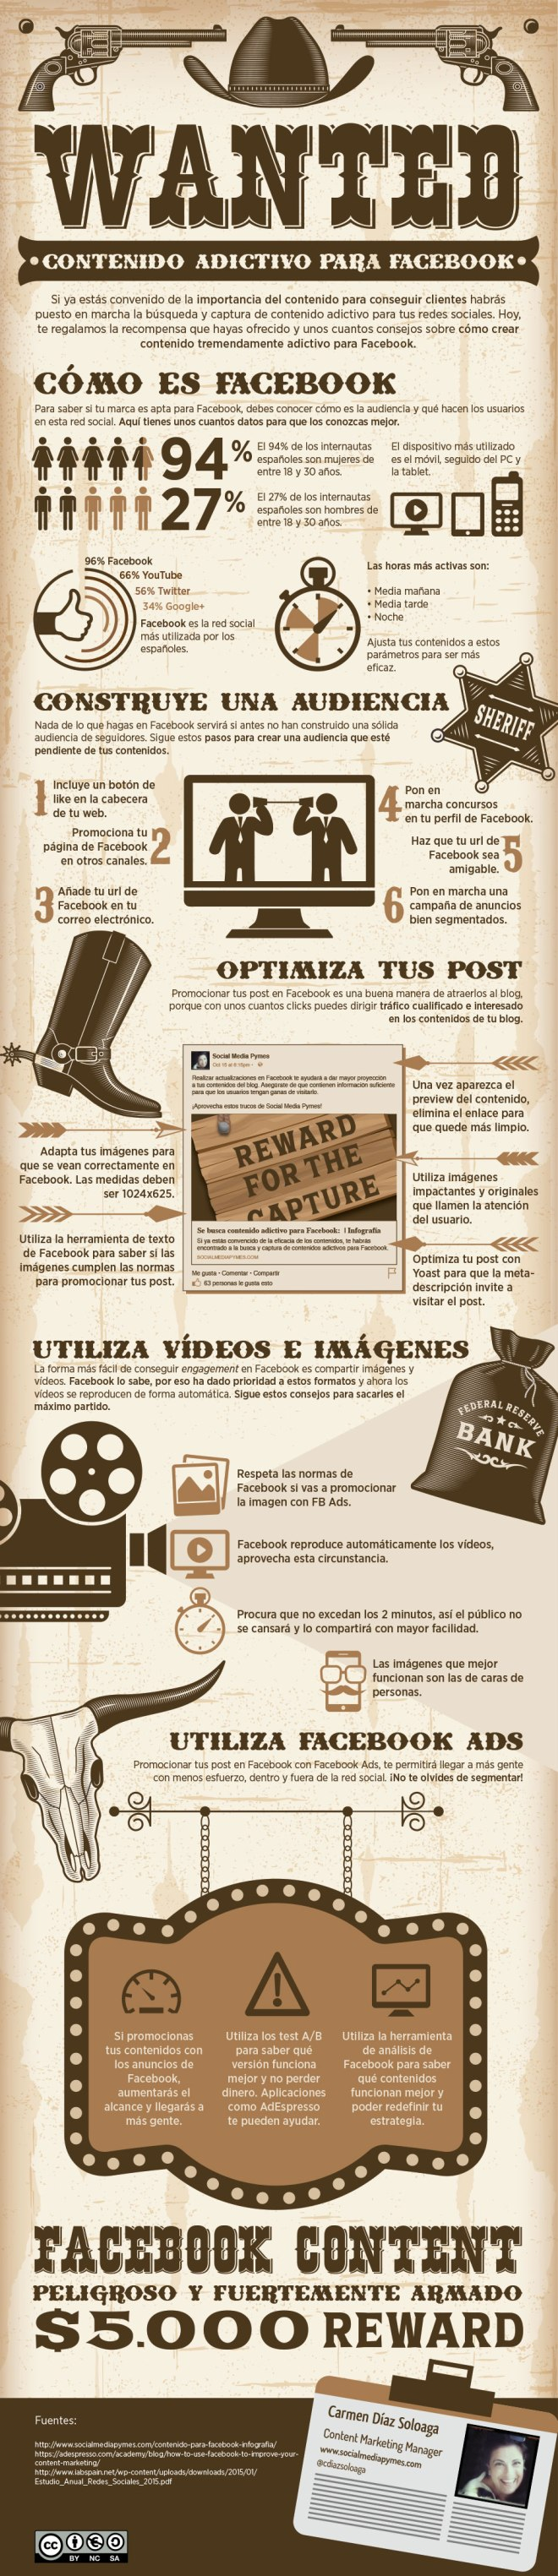 Se Busca: Contenido Adictivo para FaceBook